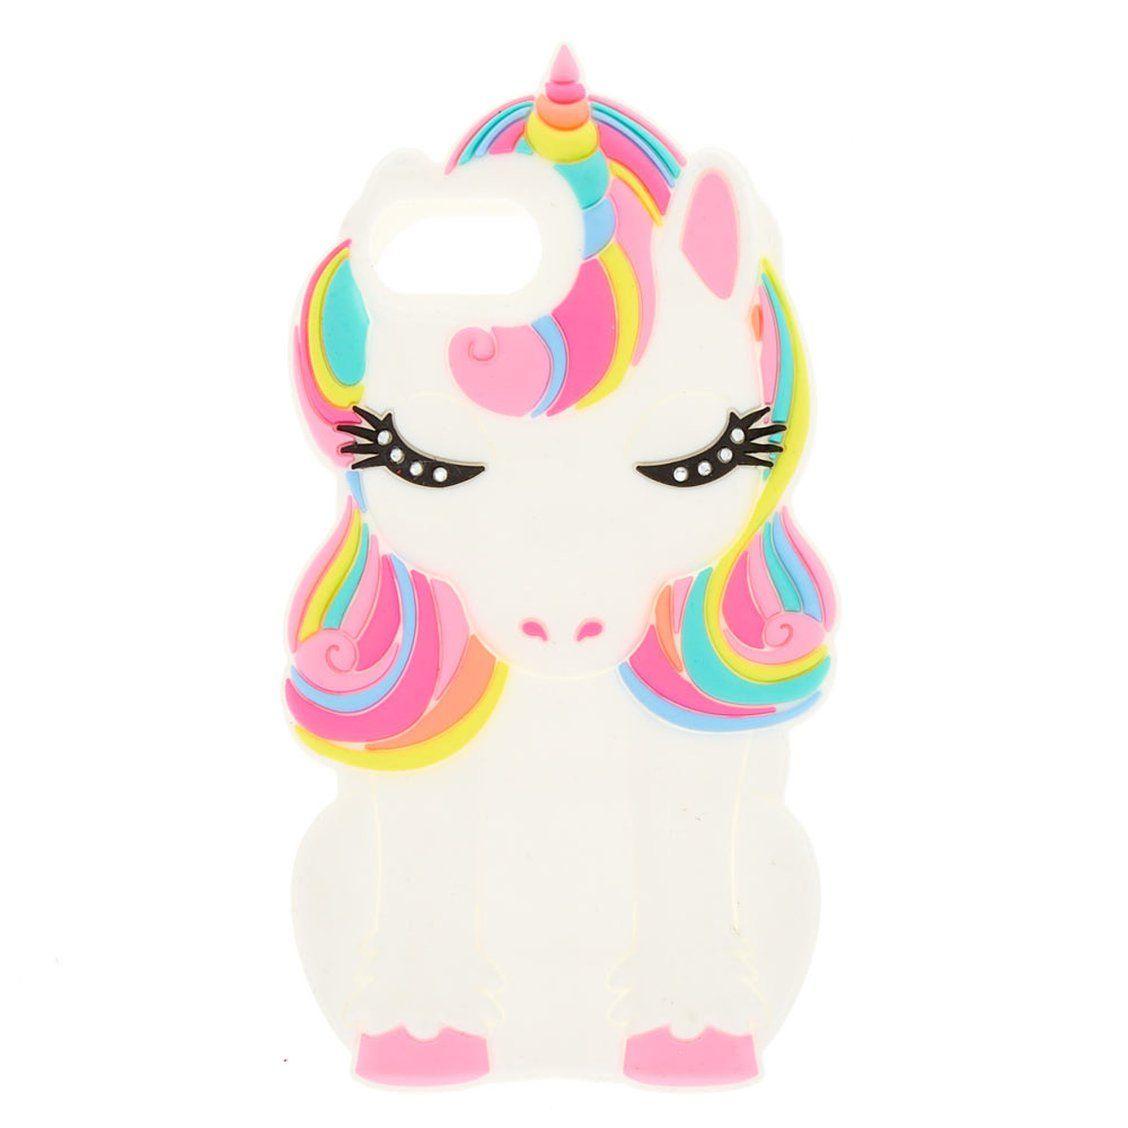 Toy Unicorn Cases For Coque IPhone 7